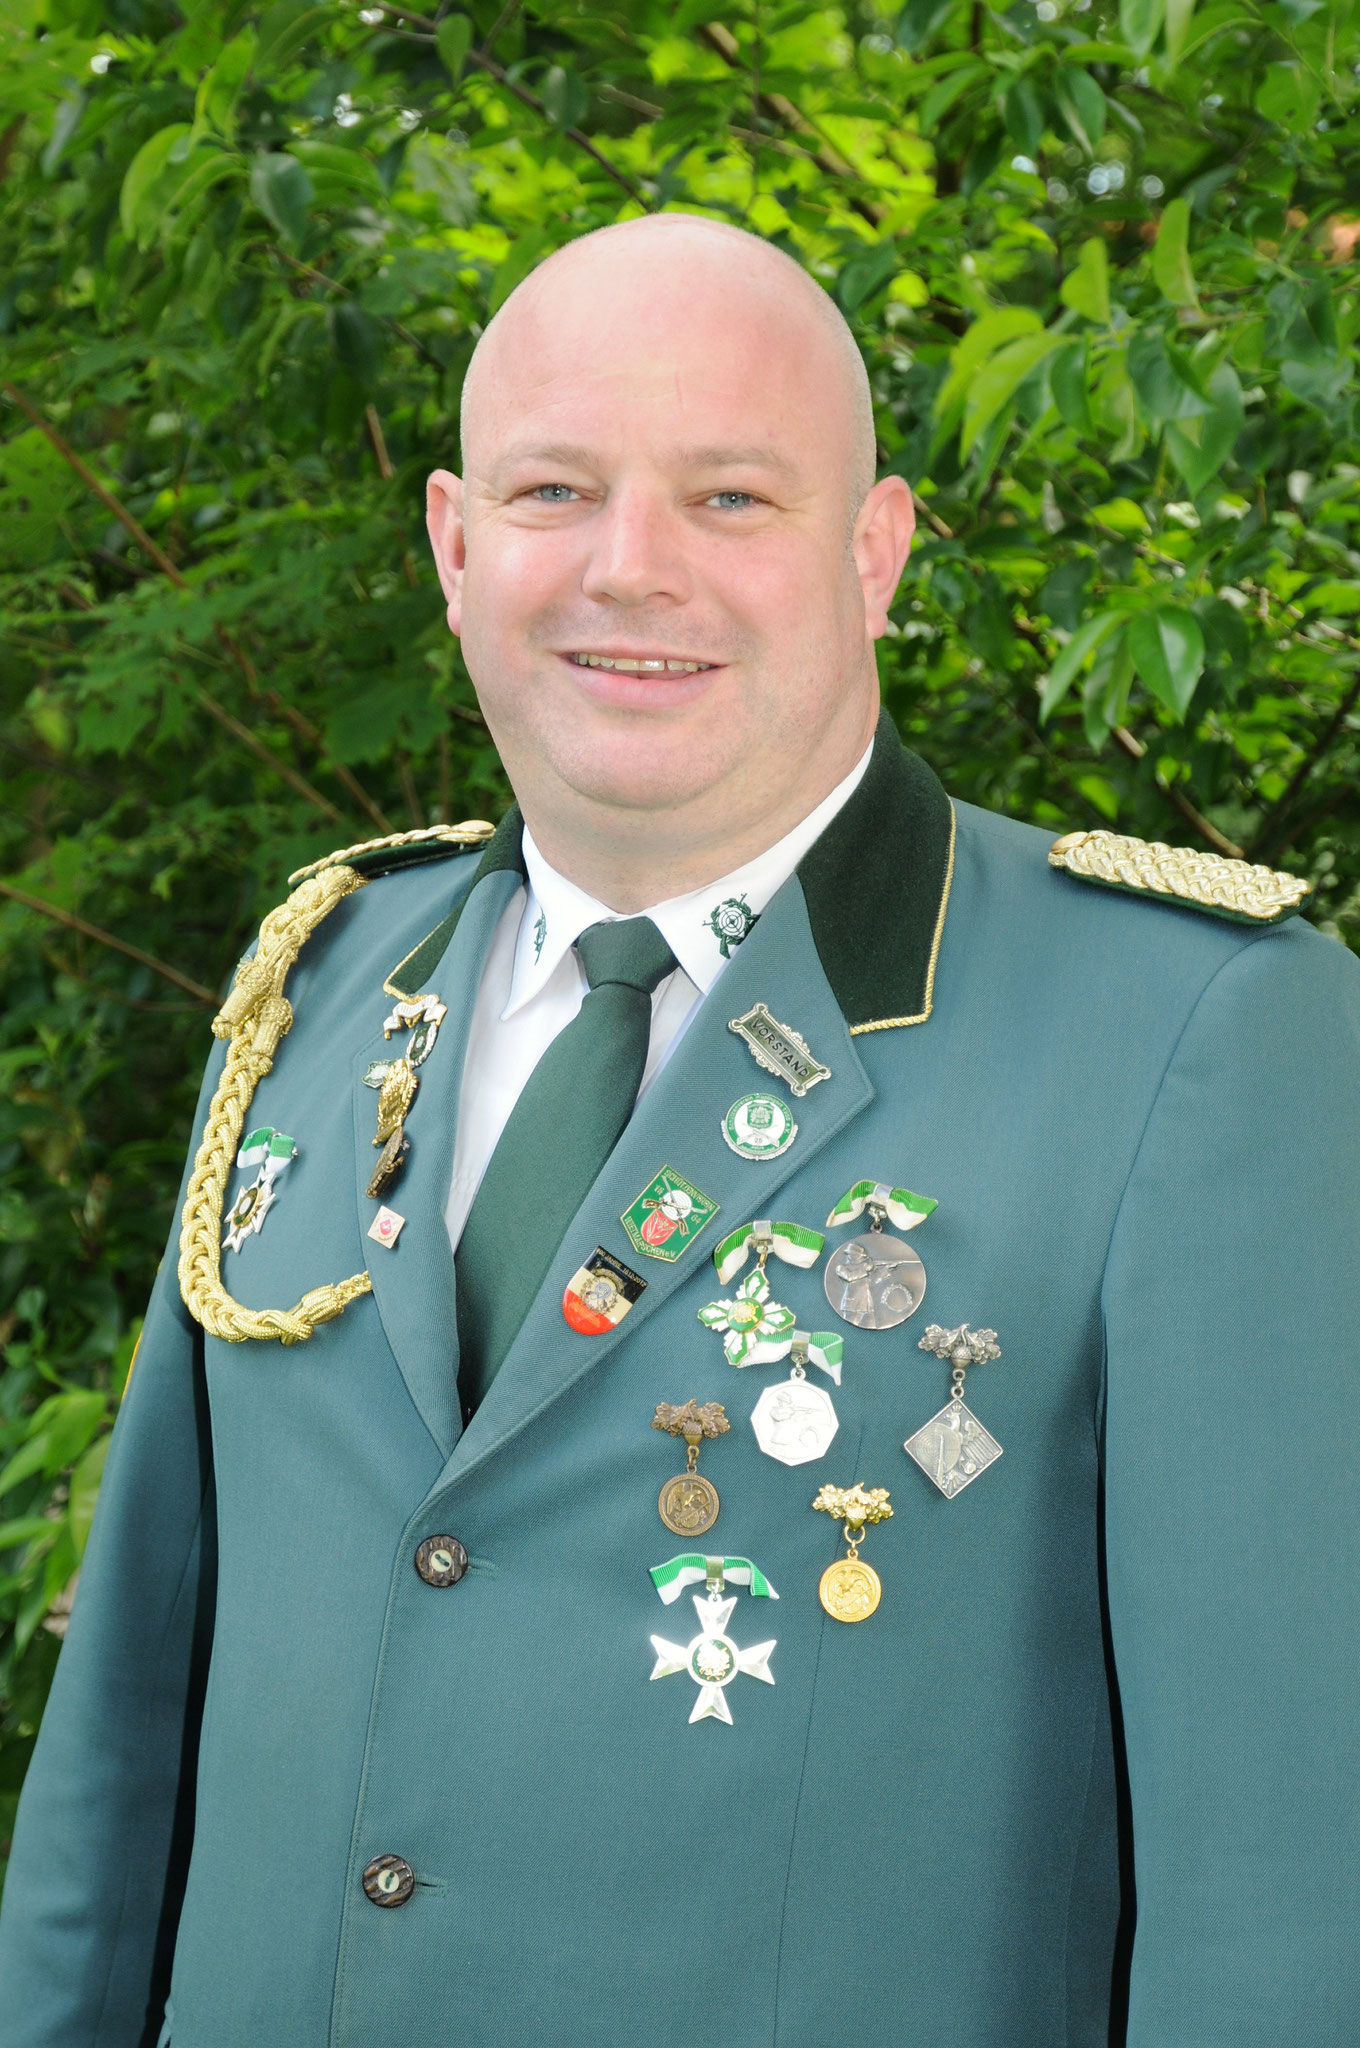 Manfred Kuhl